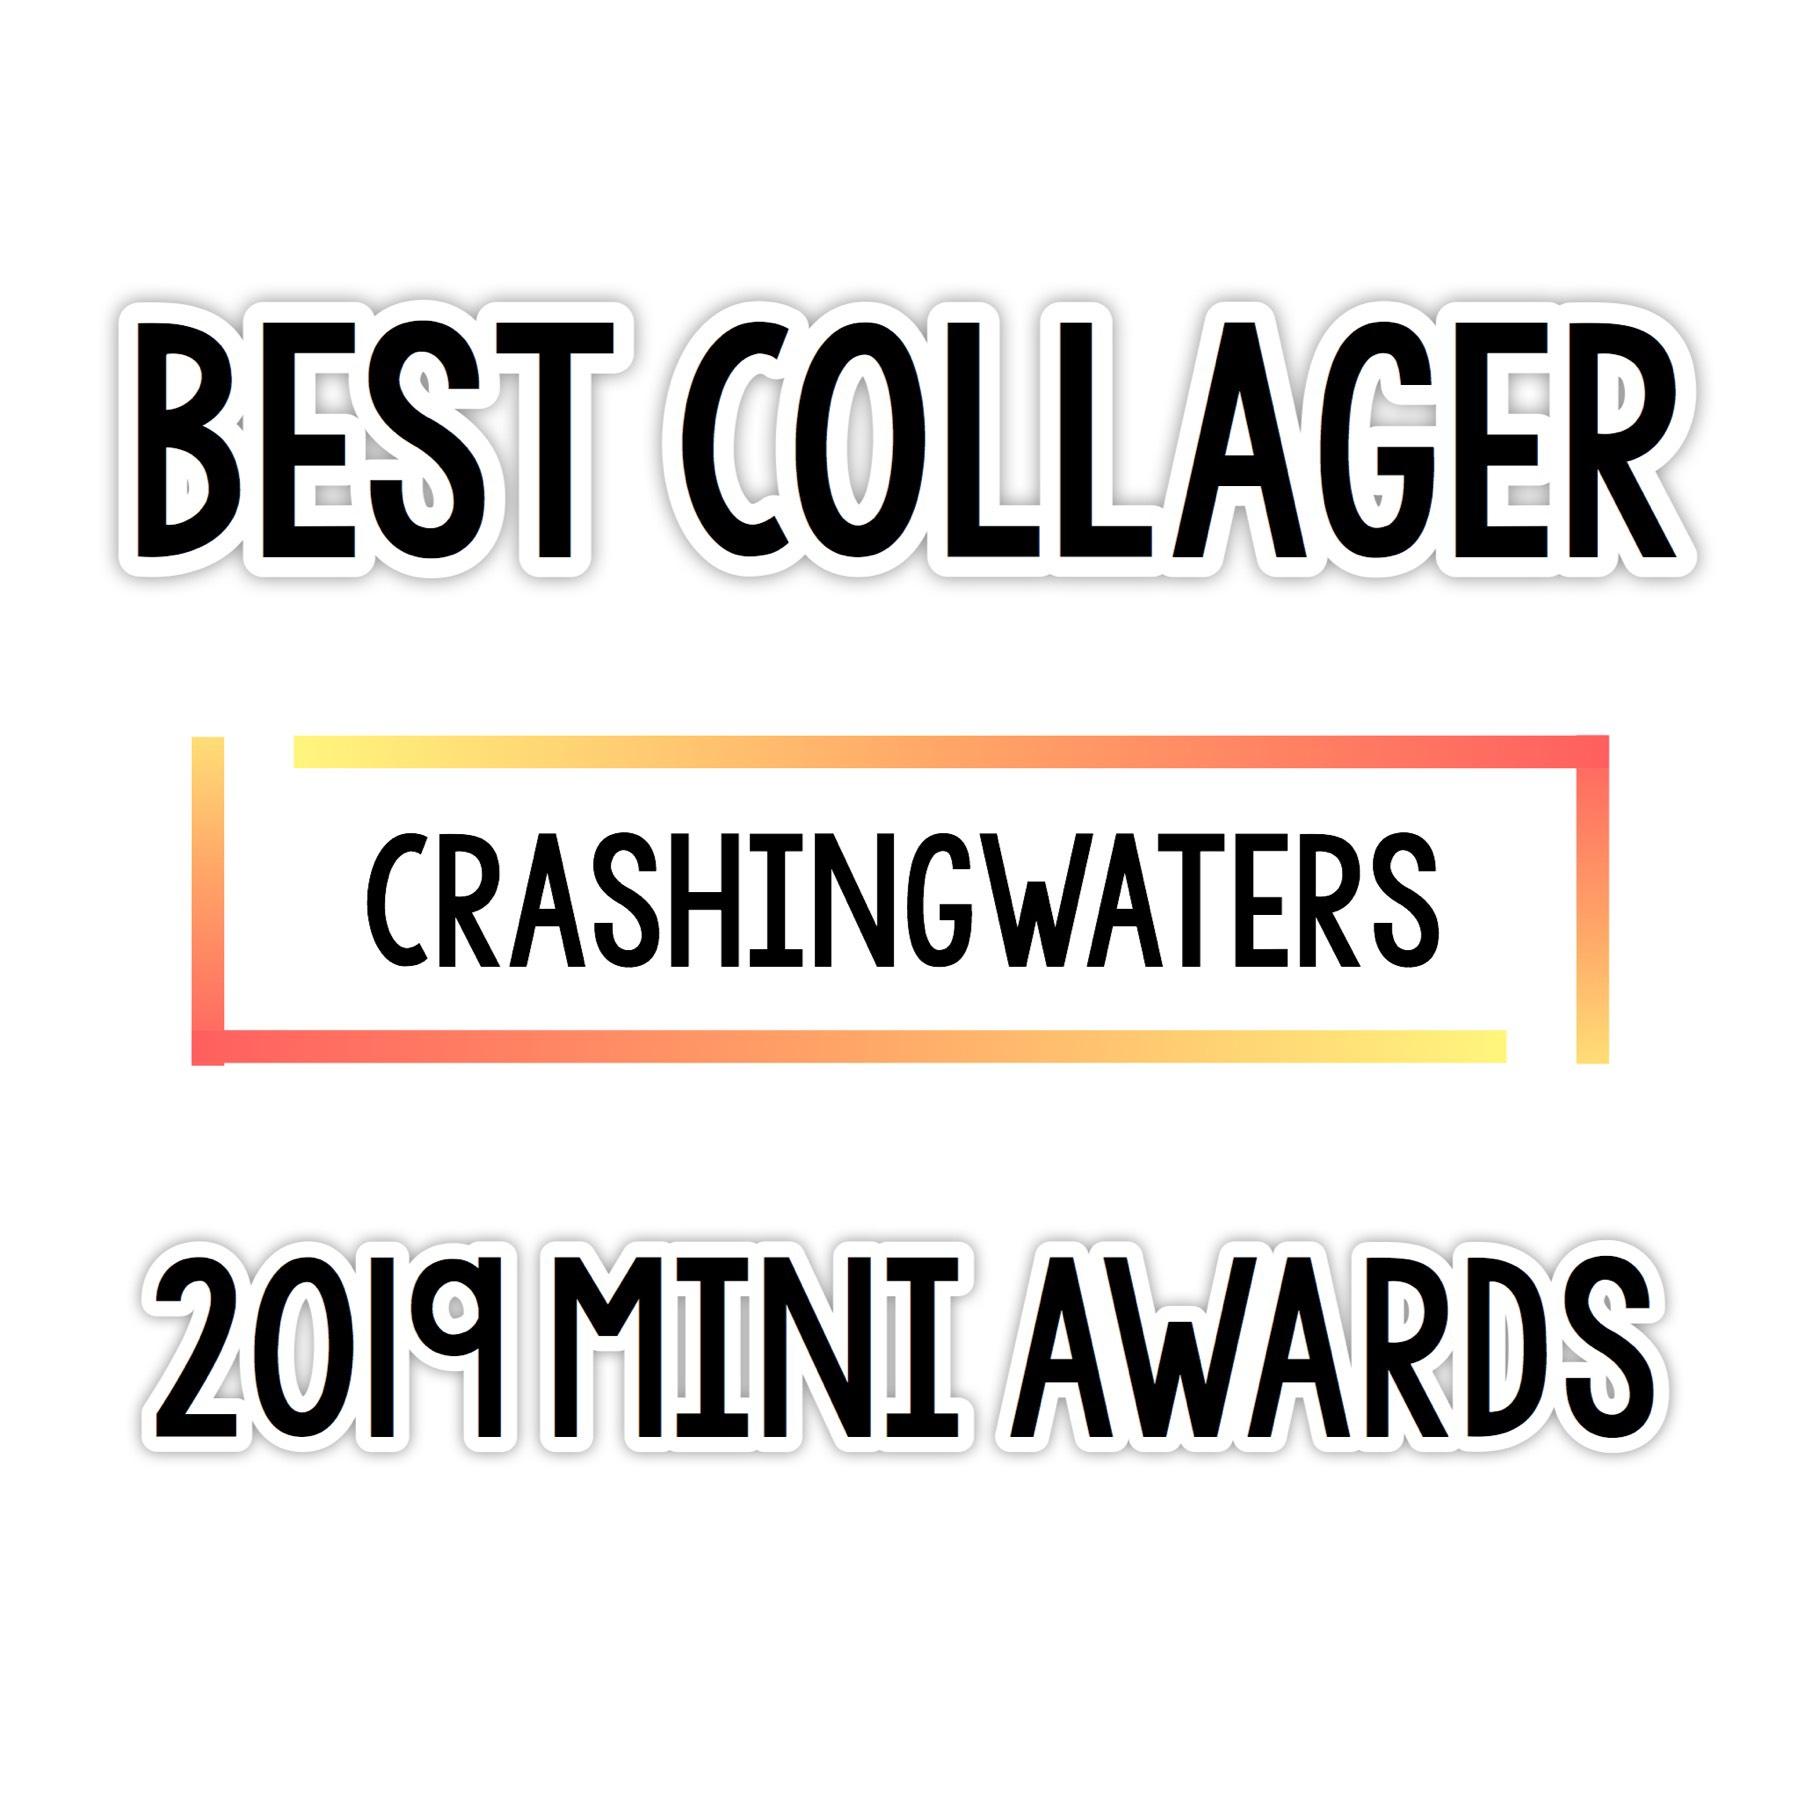 Congratulations CrashingWaters !